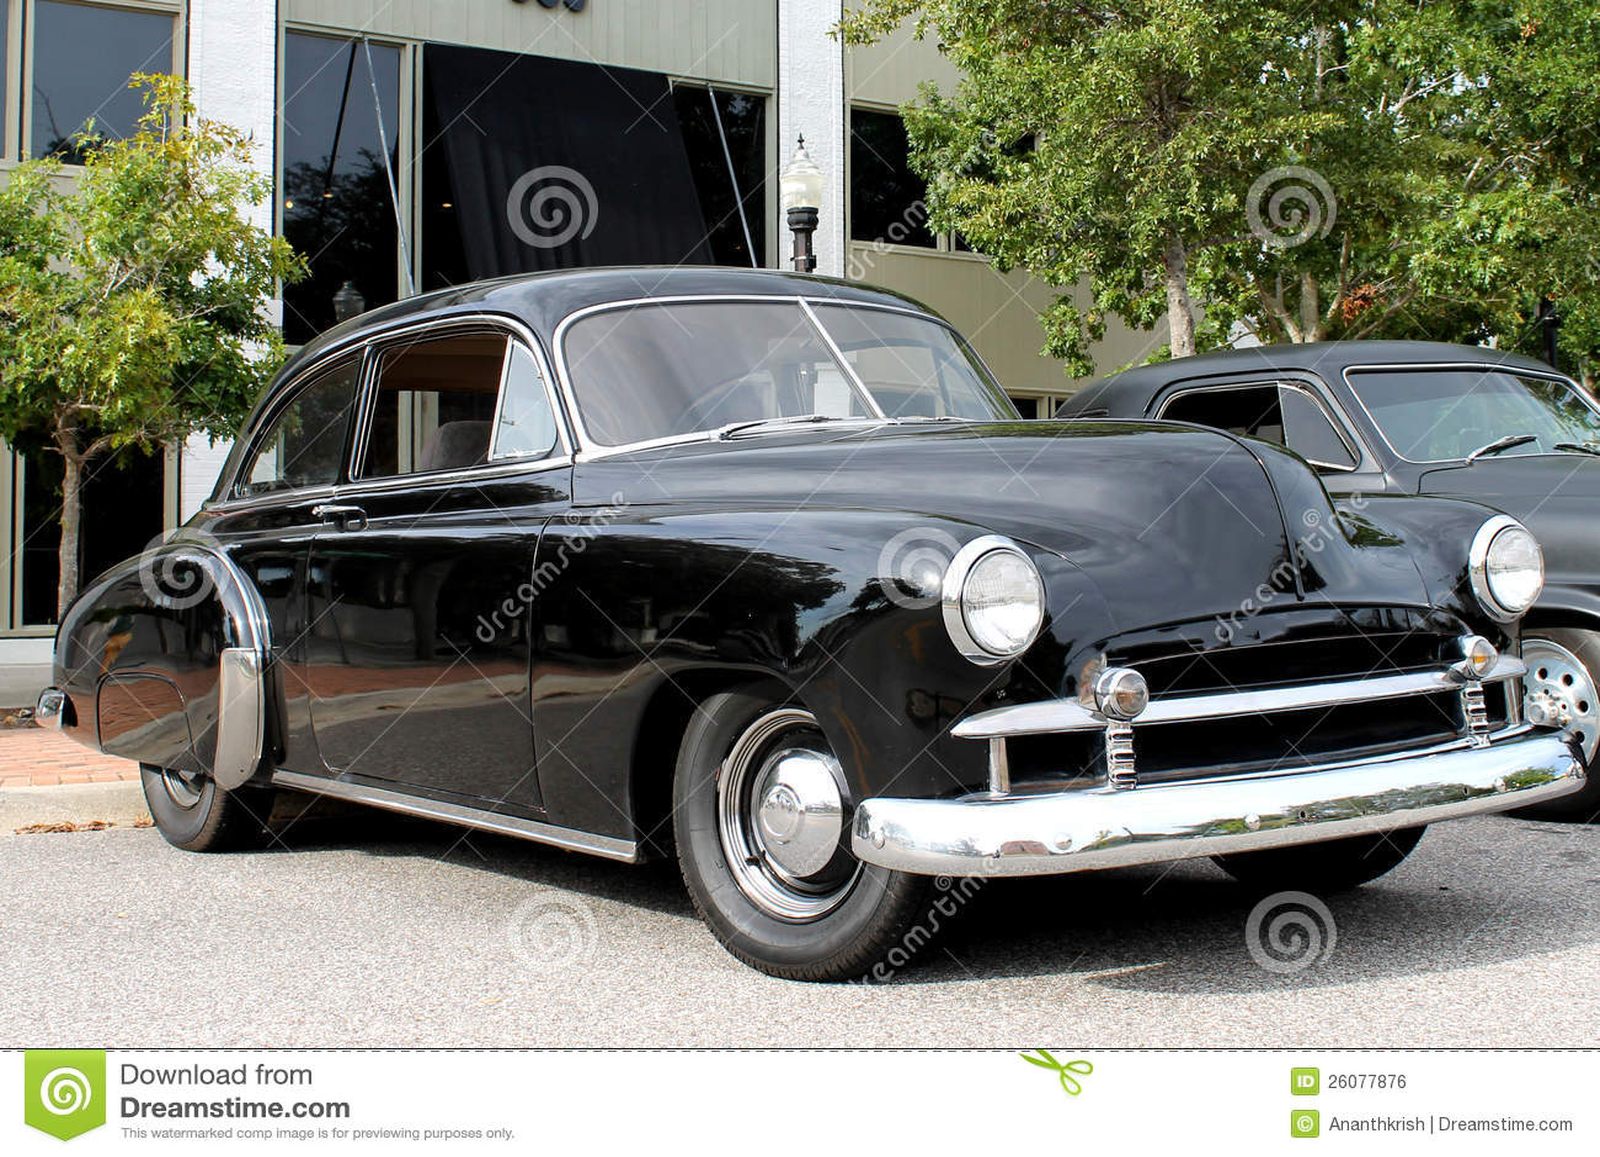 Generous Old Chevrolet Cars Photos - Classic Cars Ideas - boiq.info